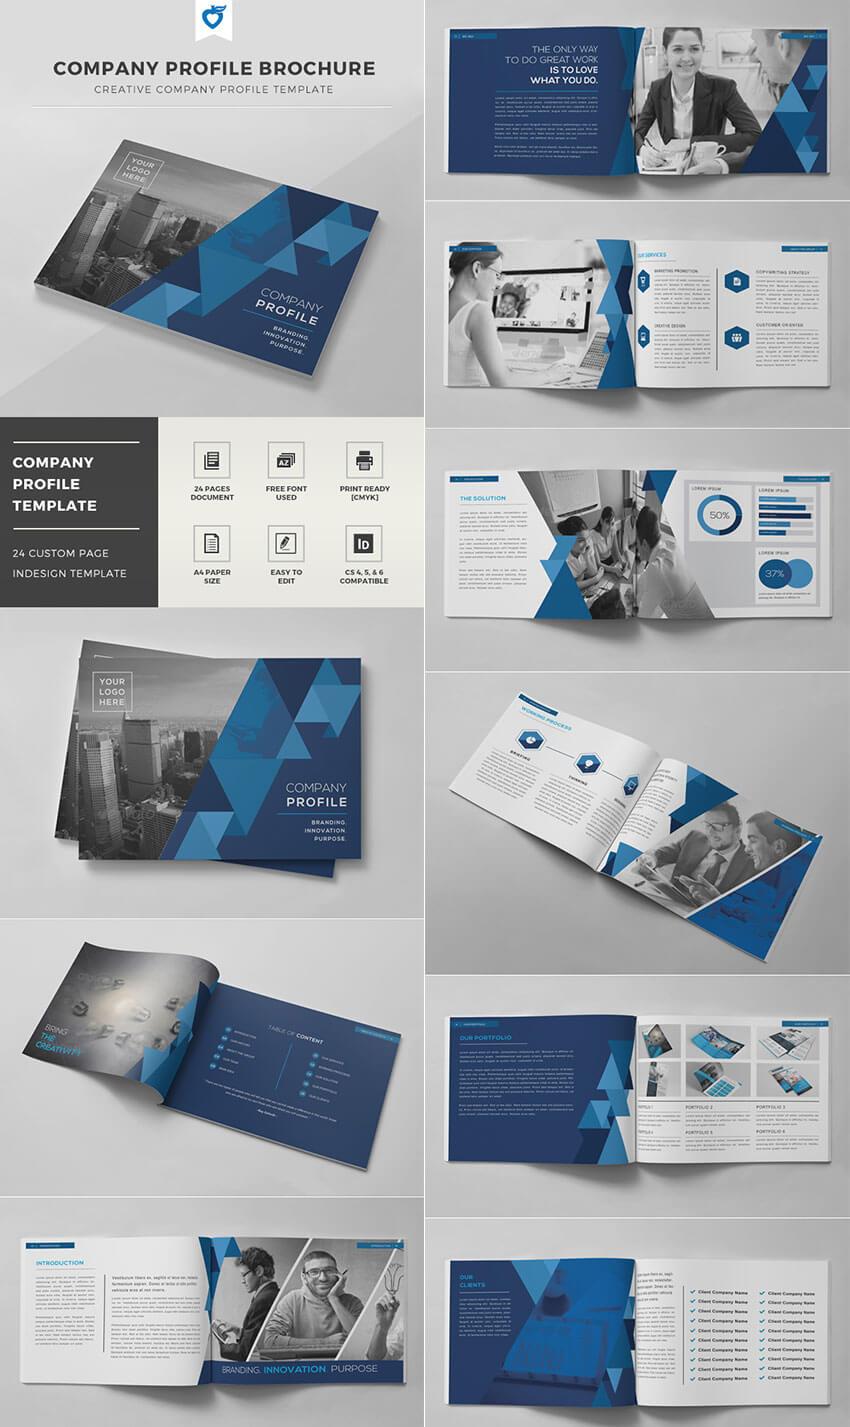 20 Кращих Шаблонів Indesign Brochure - Для Творчого With Regard To Brochure Template Indesign Free Download